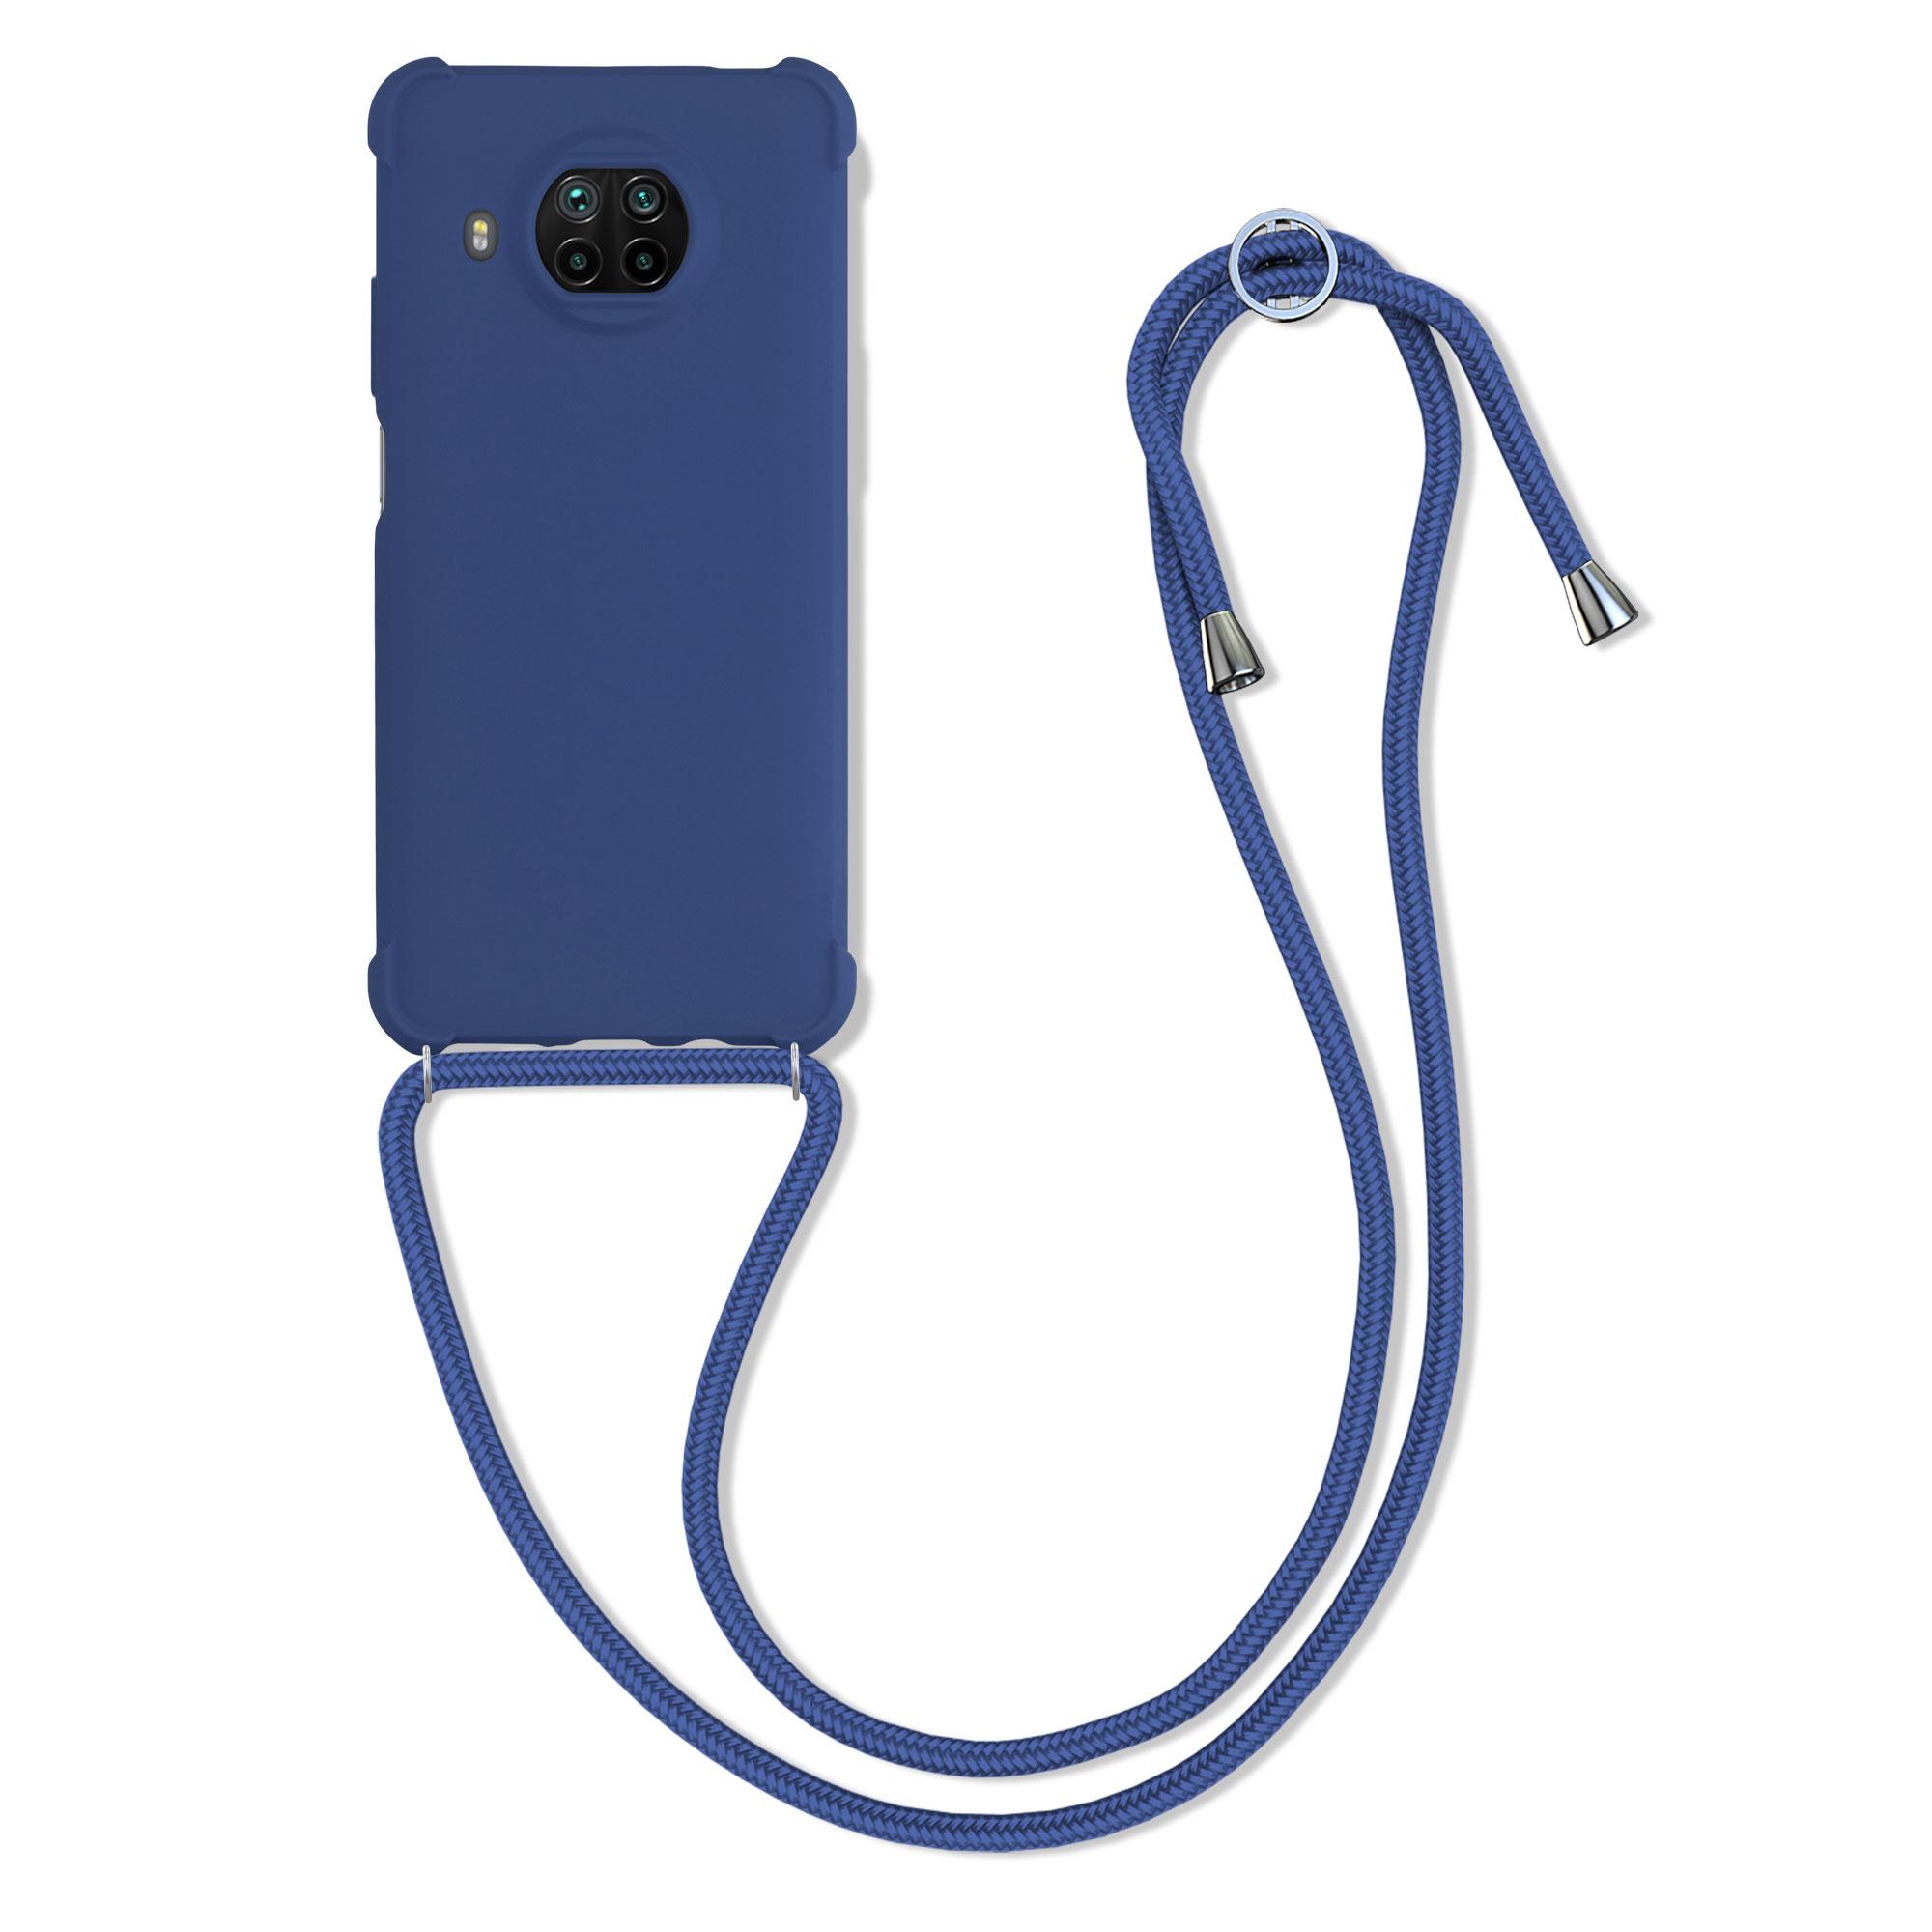 Tmavé modré silikonové pouzdro / obal na krk pro Xiaomi Mi 10T Lite